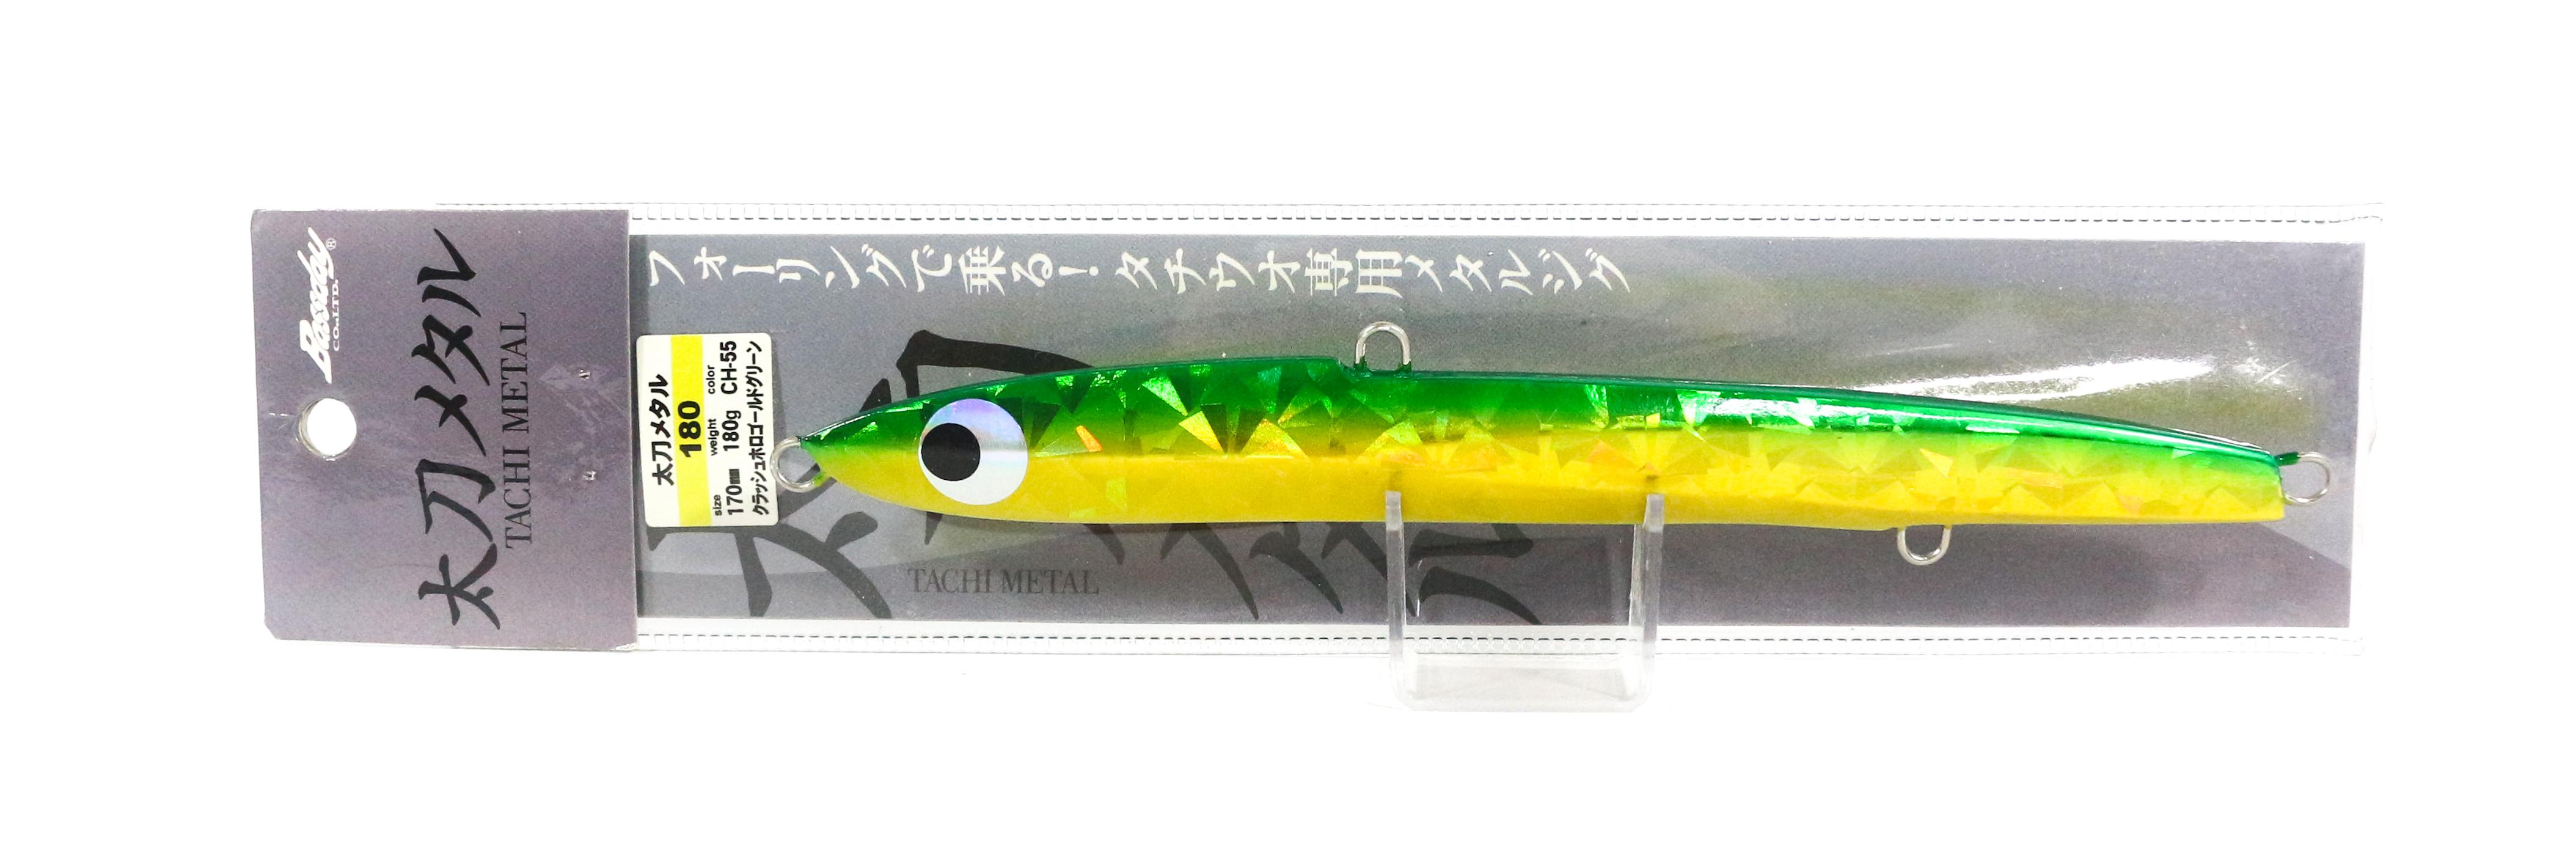 Sale Bassday Metal Jig Tachi Metal 180 grams CH-55 (5127)